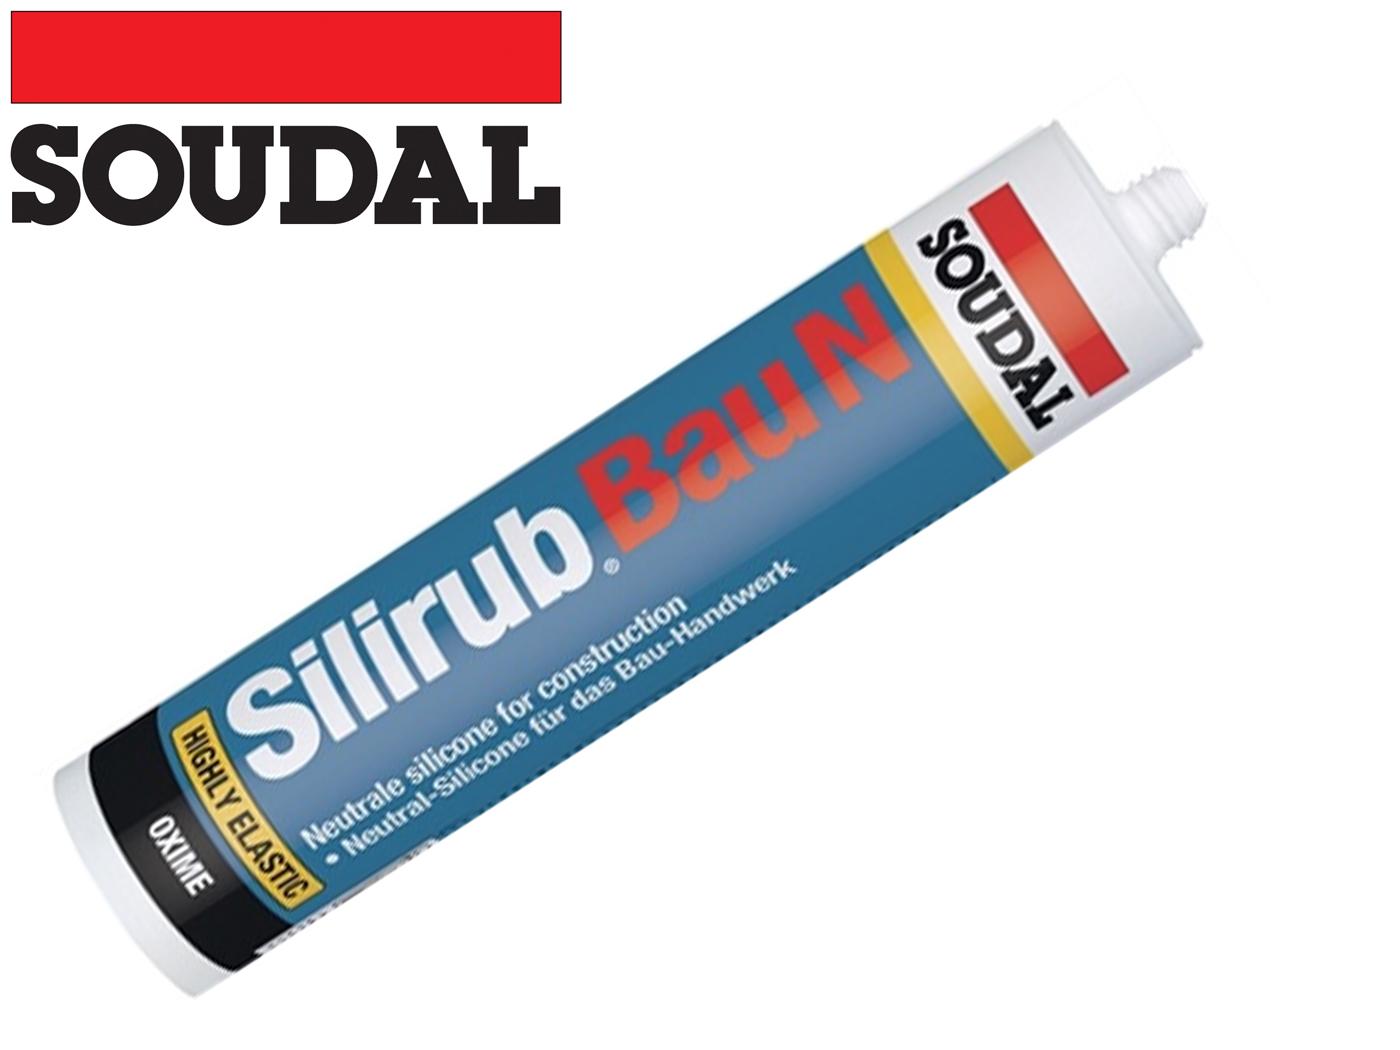 Siliconenkit Silirub constructie N wit 310 ml patroon SOUDAL